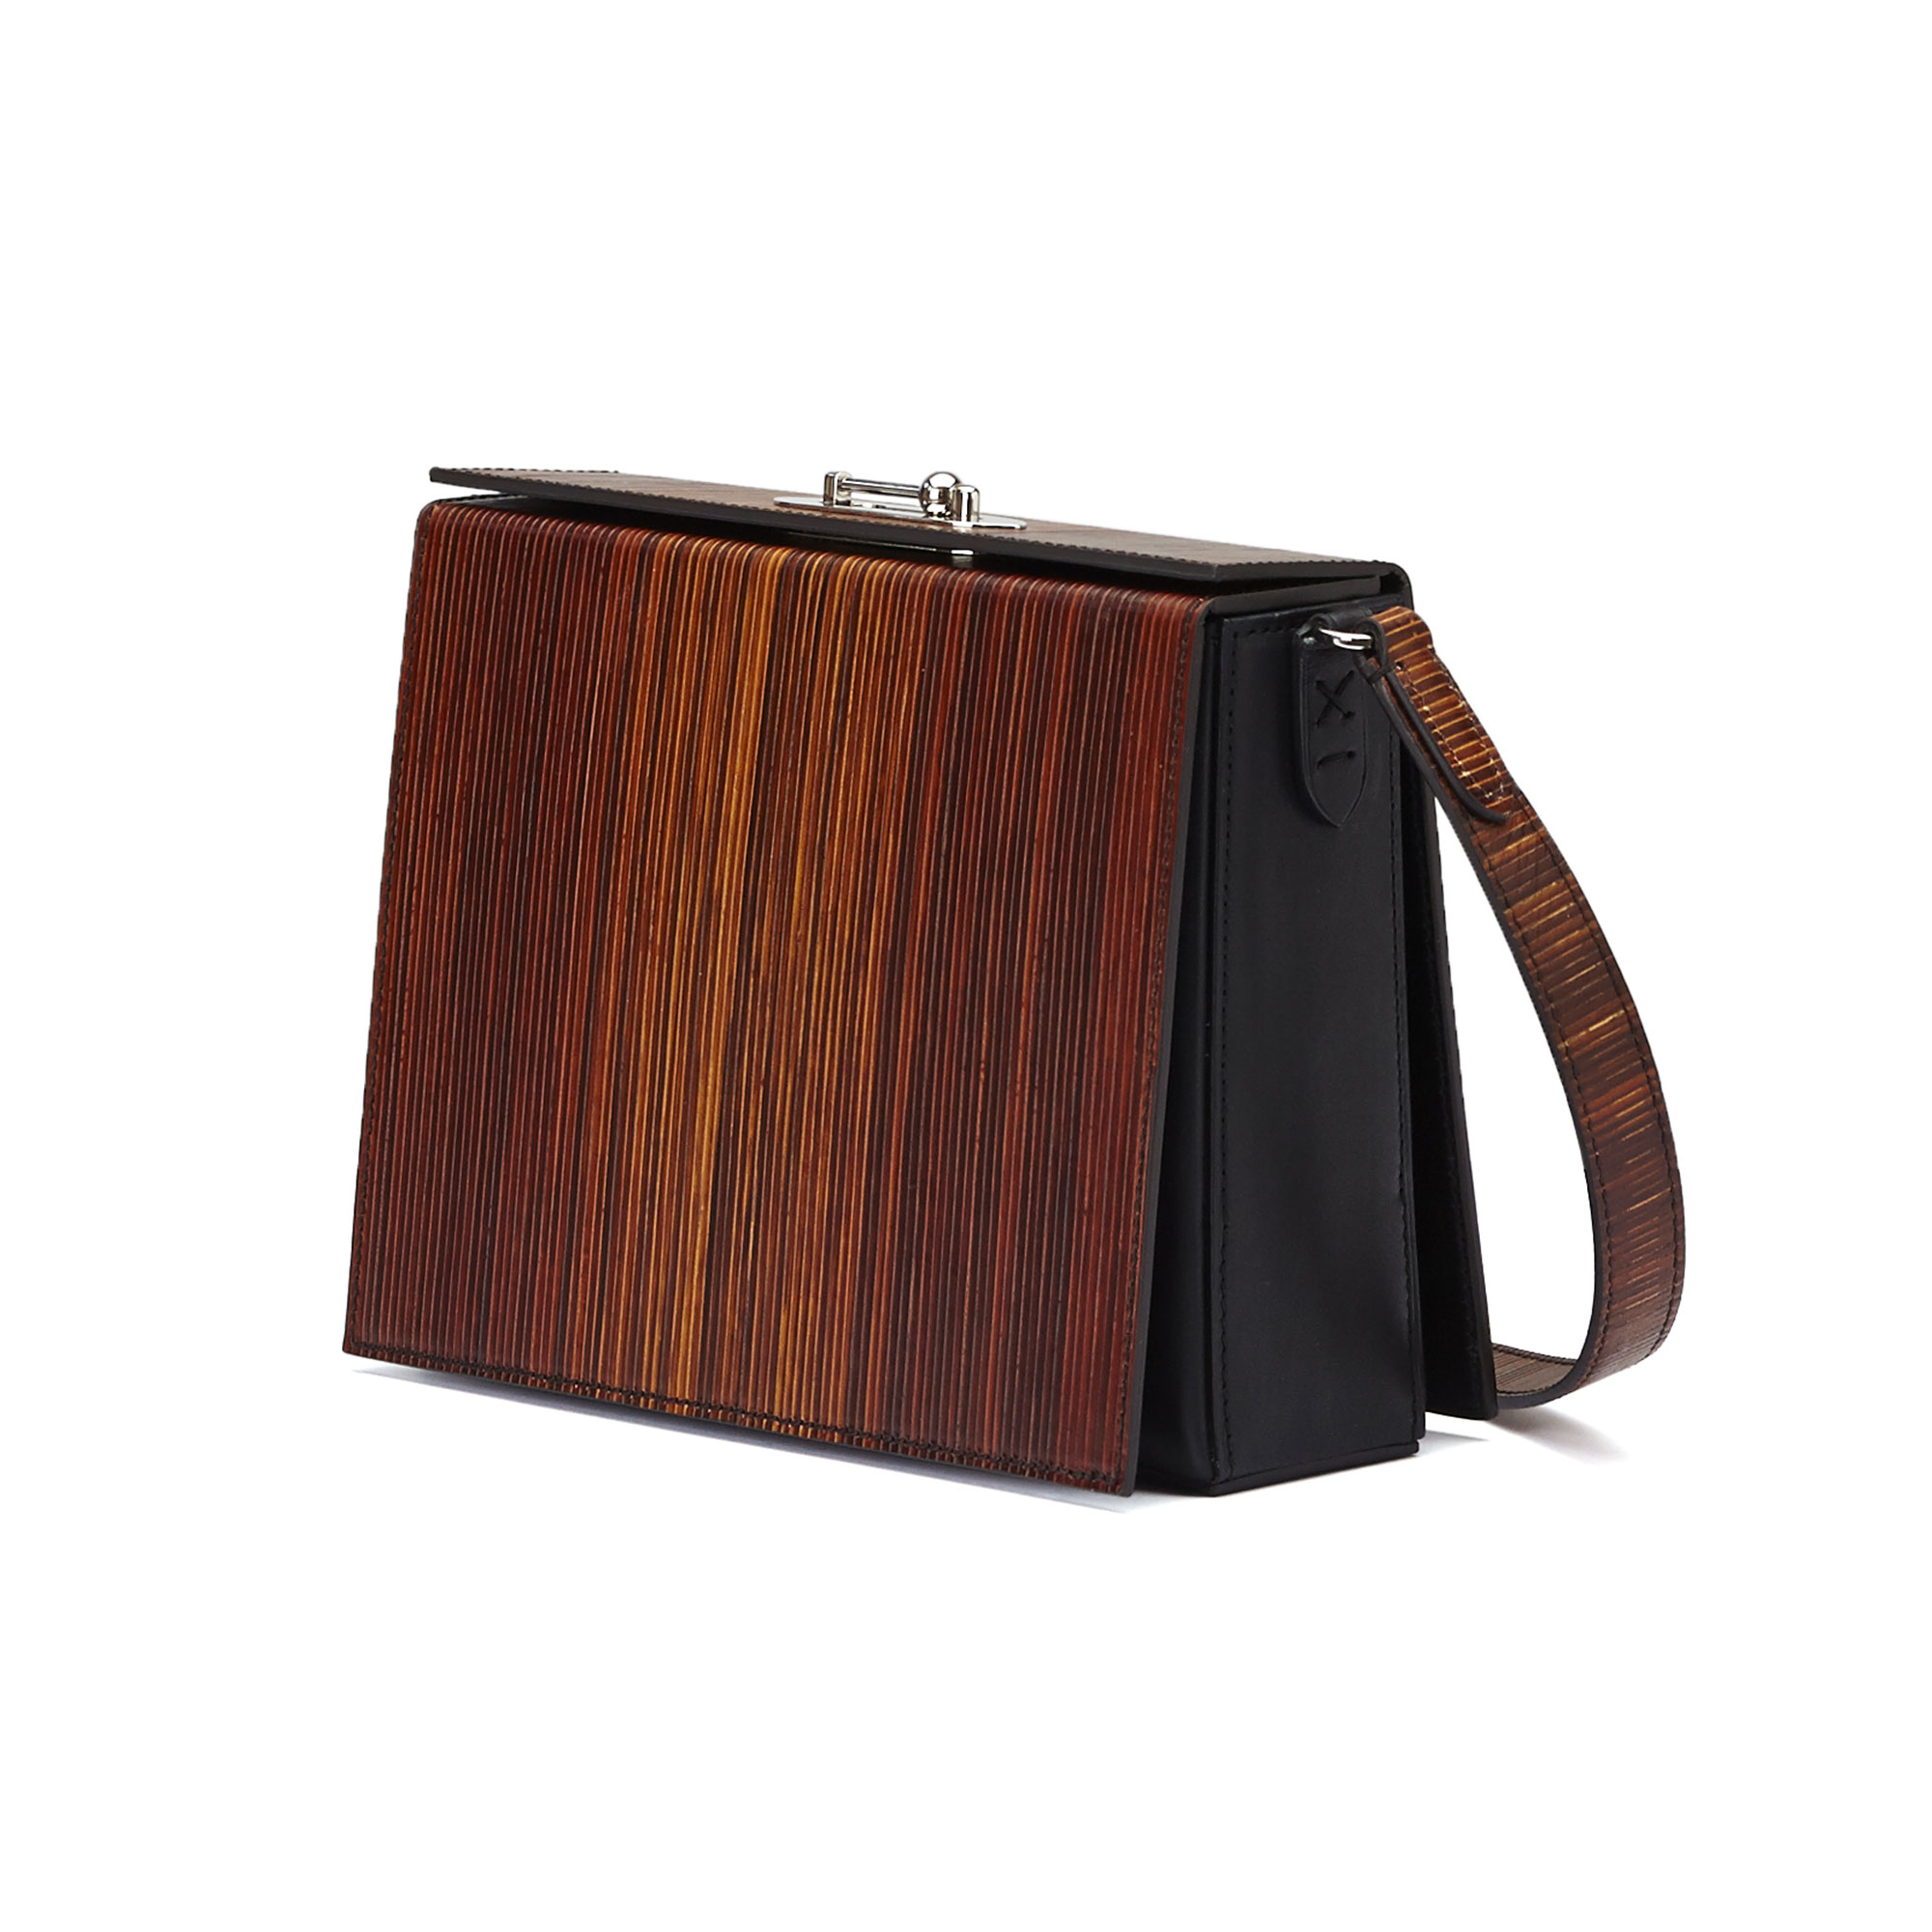 The black effect wood leather french calf Gemma Crossbody bag by Bertoni 1949 02